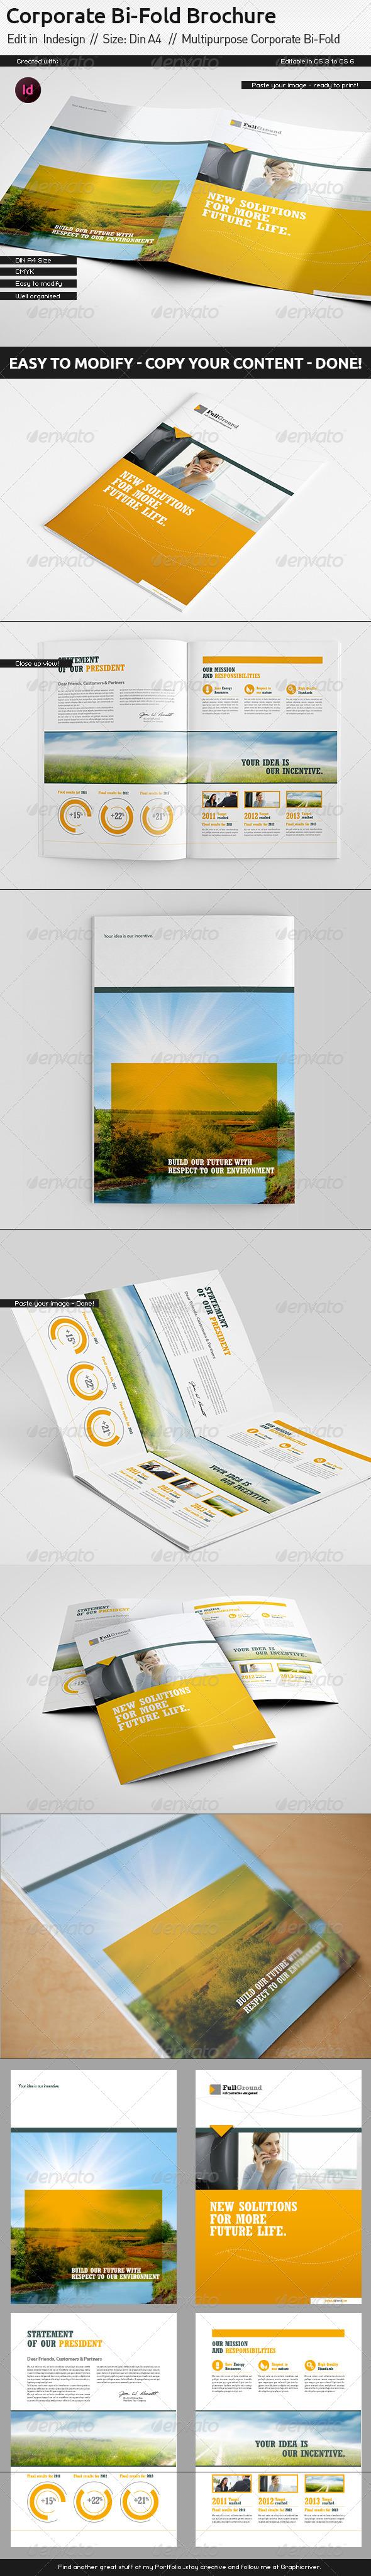 GraphicRiver Corporate Report Din A4 Bi-Fold 5551784